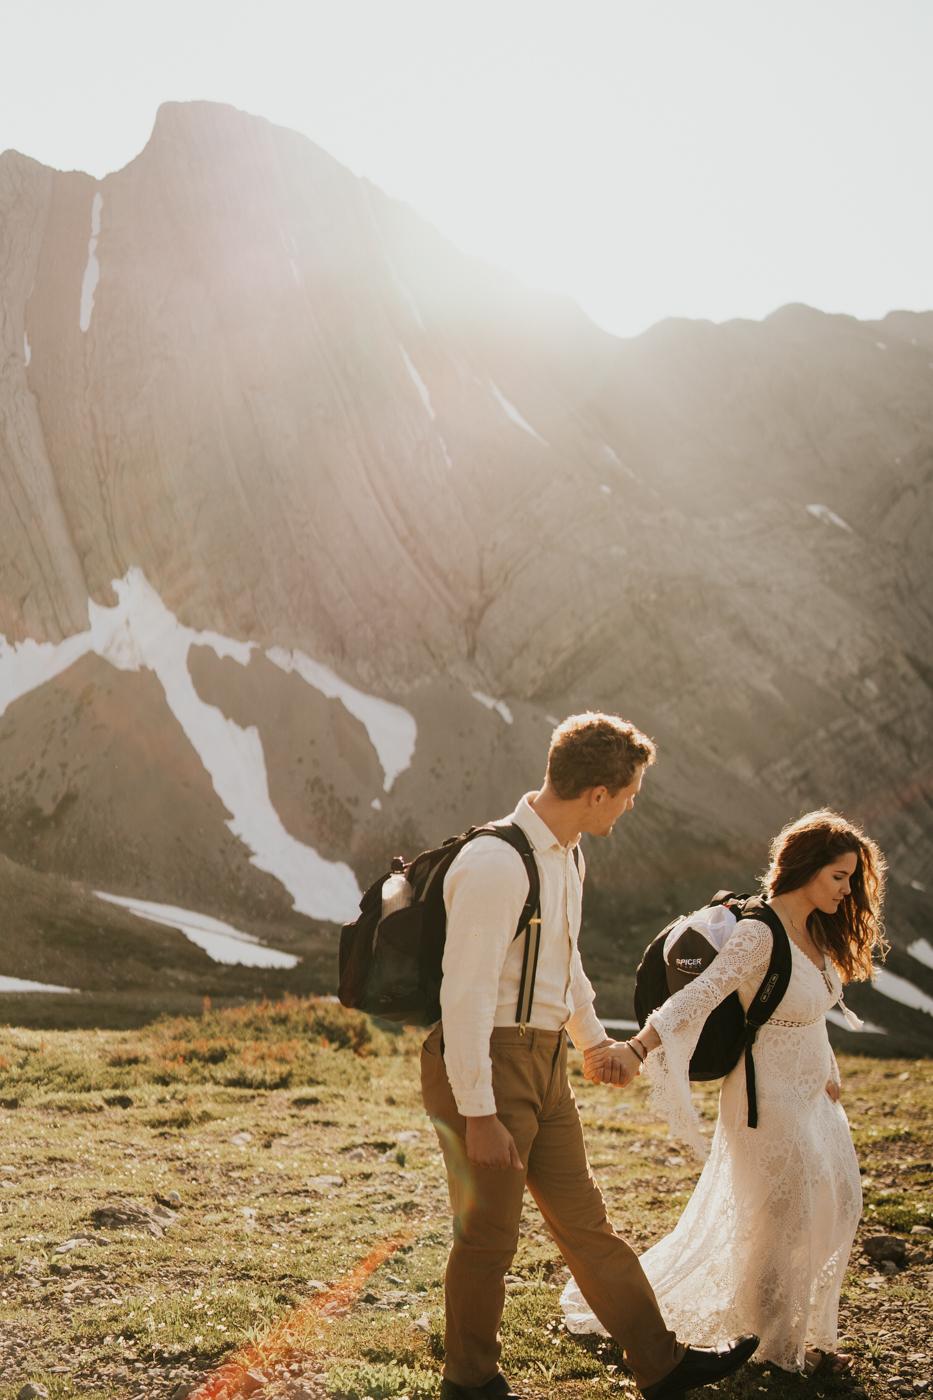 tyraephotography_photographer_wedding_elopement_engagement_photography-08455.jpg